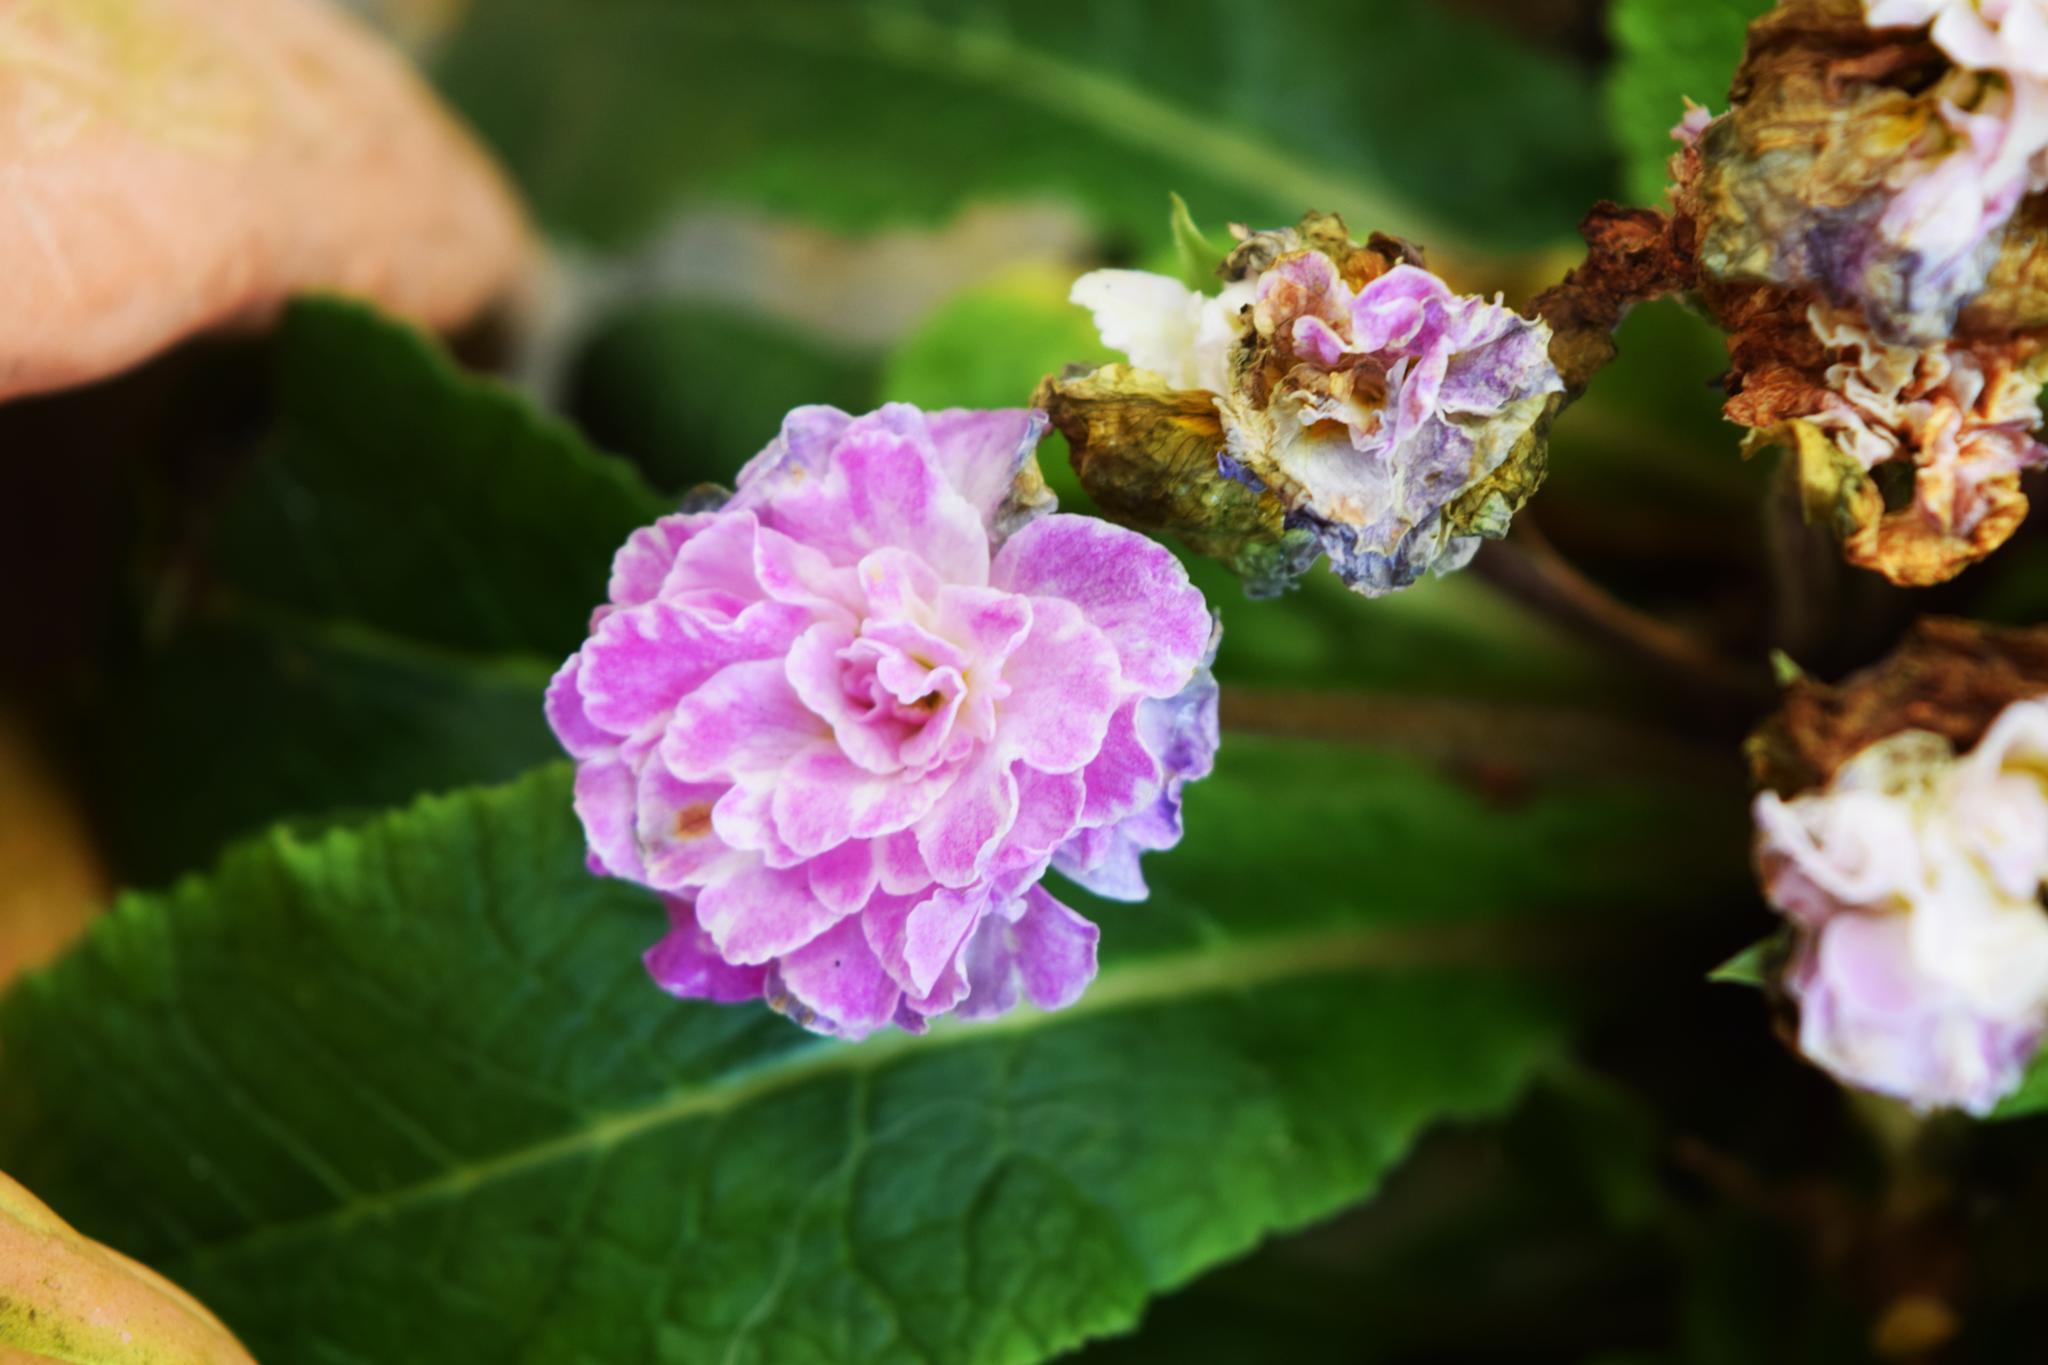 The last Blossom by A Quiet Whisper/Melanie Daignault